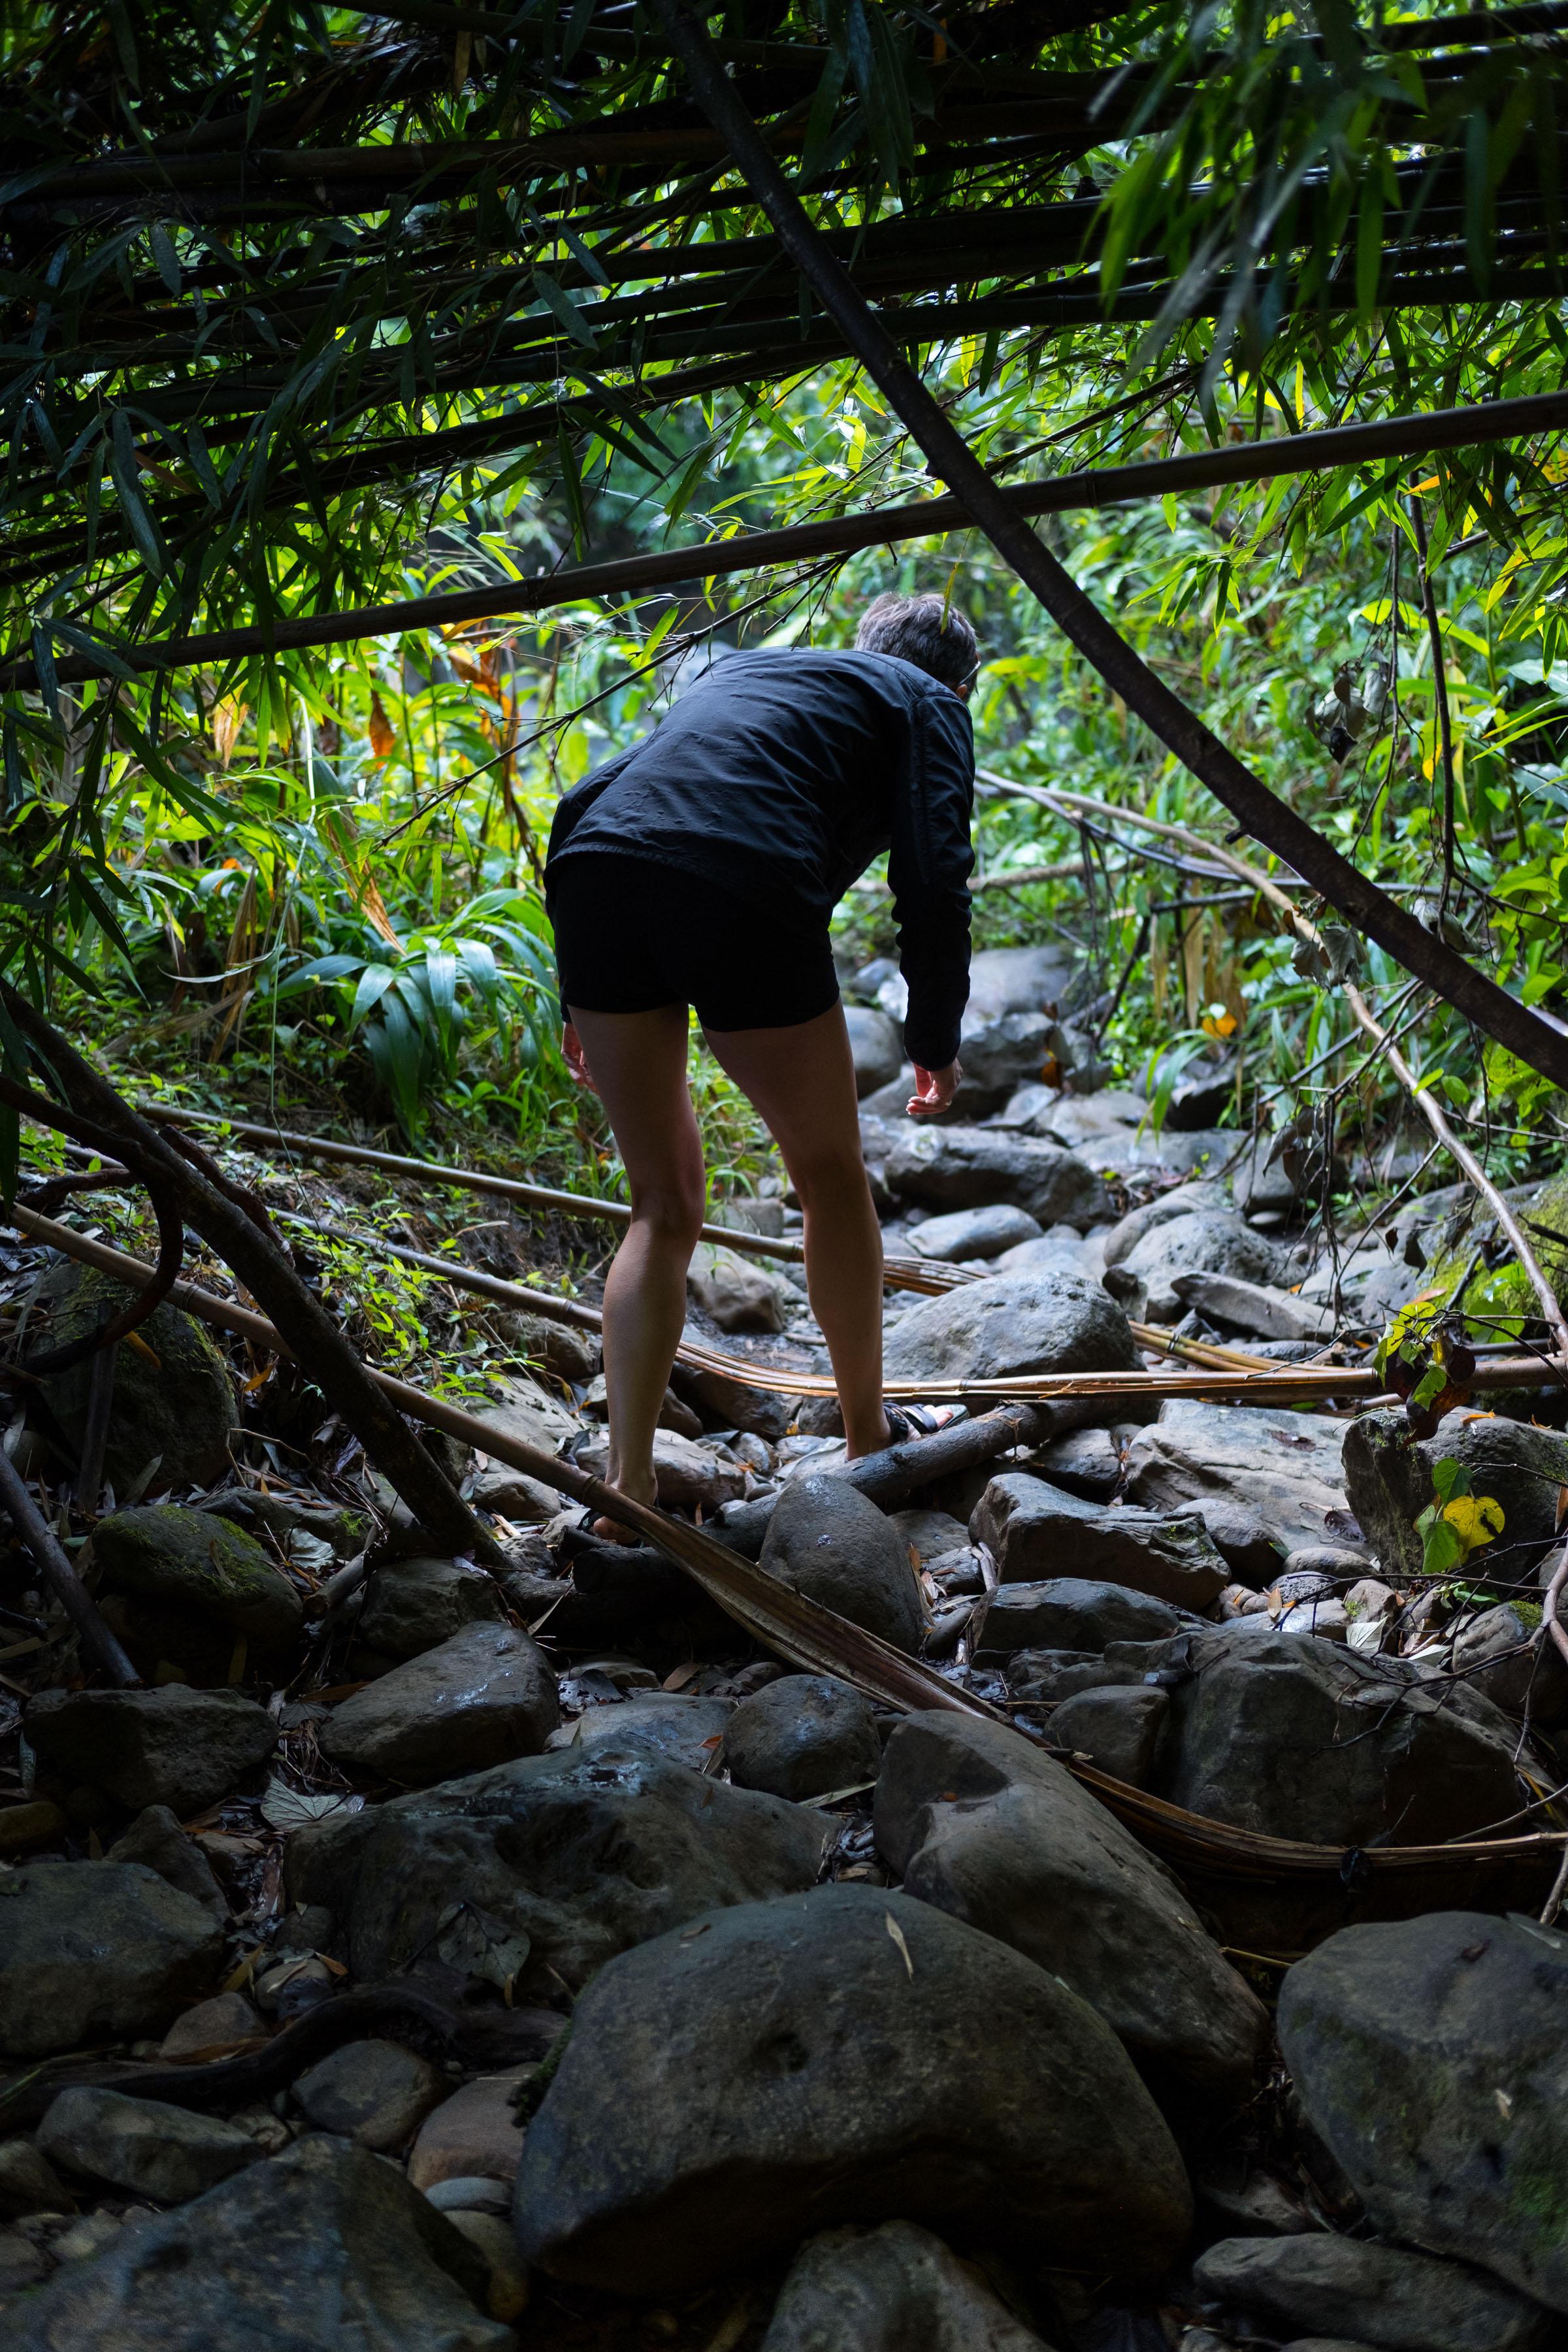 DSCF2592_Bamboo Forest.jpg